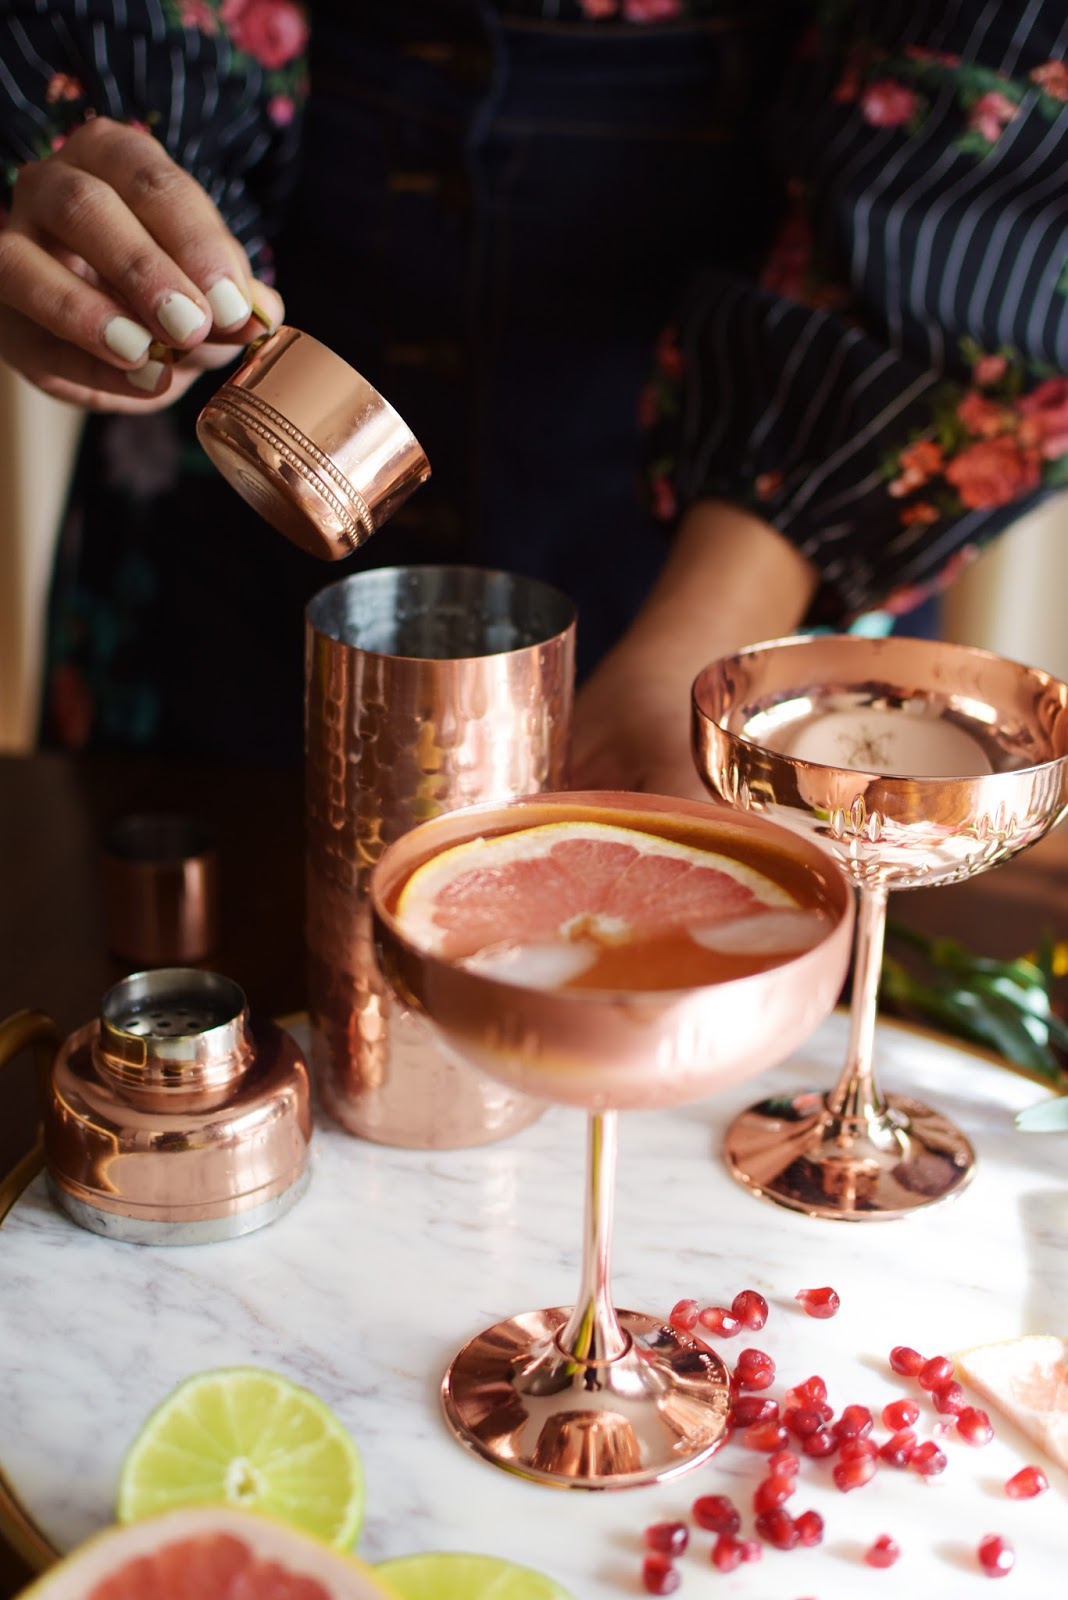 holiday cocktail, thanksgiving cocktail, absolut elyx, copper makes it better, copper vessel drink, fennel grapefruit vodka drink, entertaining, hostess drink, myriad musings, drink, cocktails